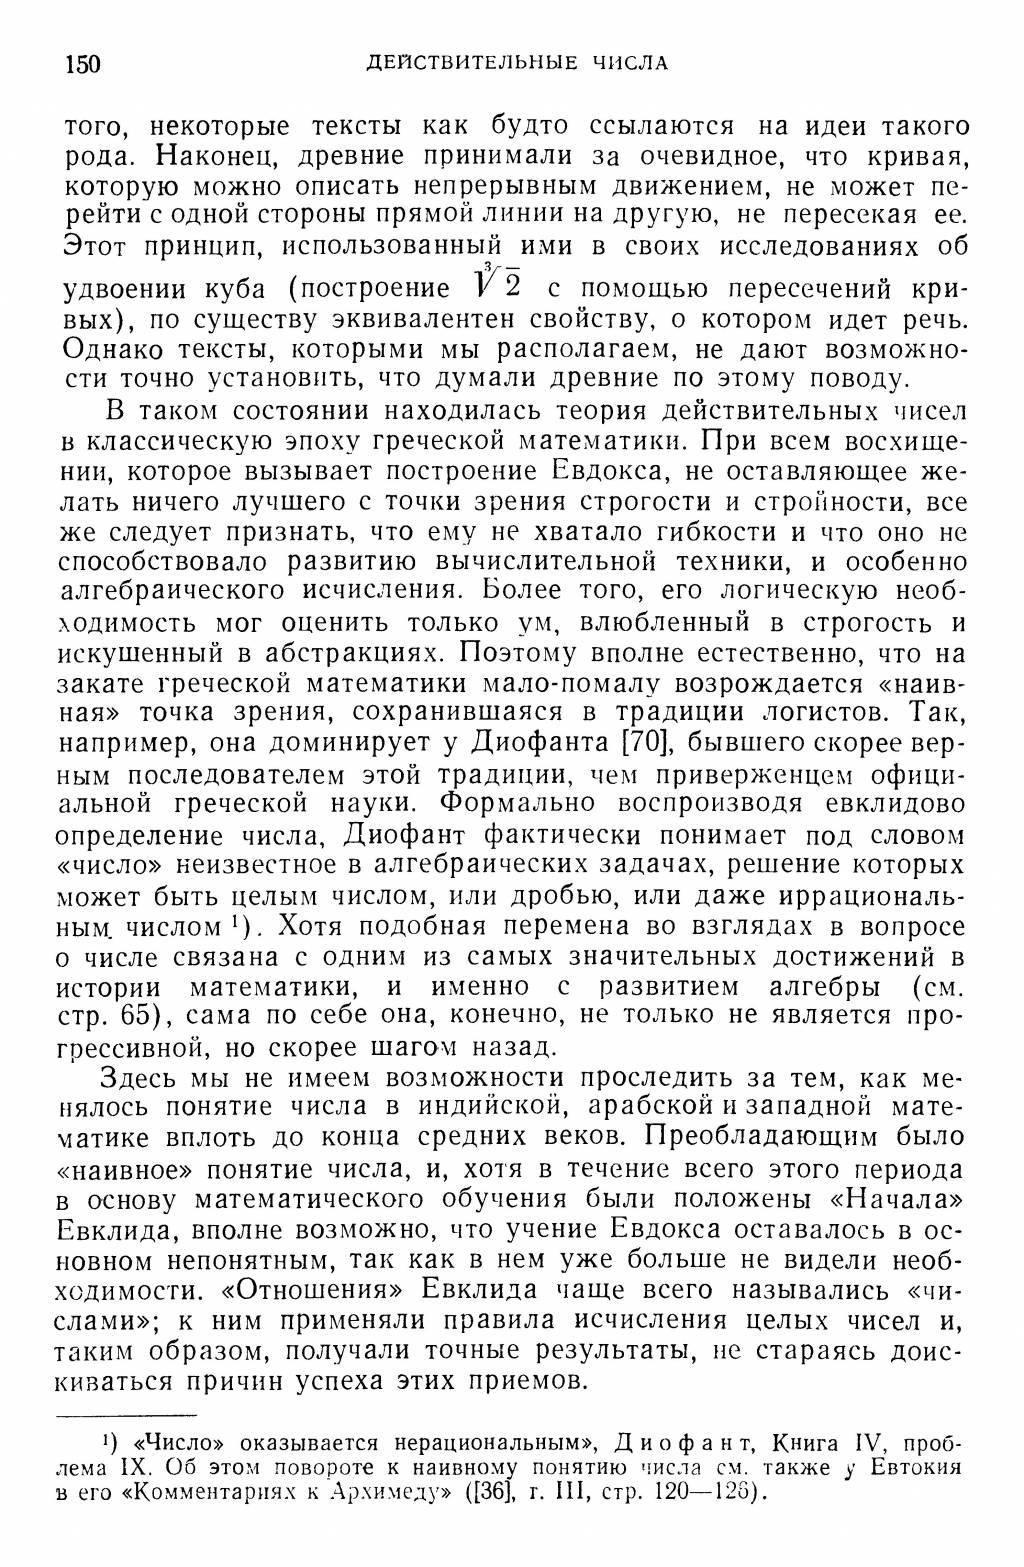 p0150.jpg